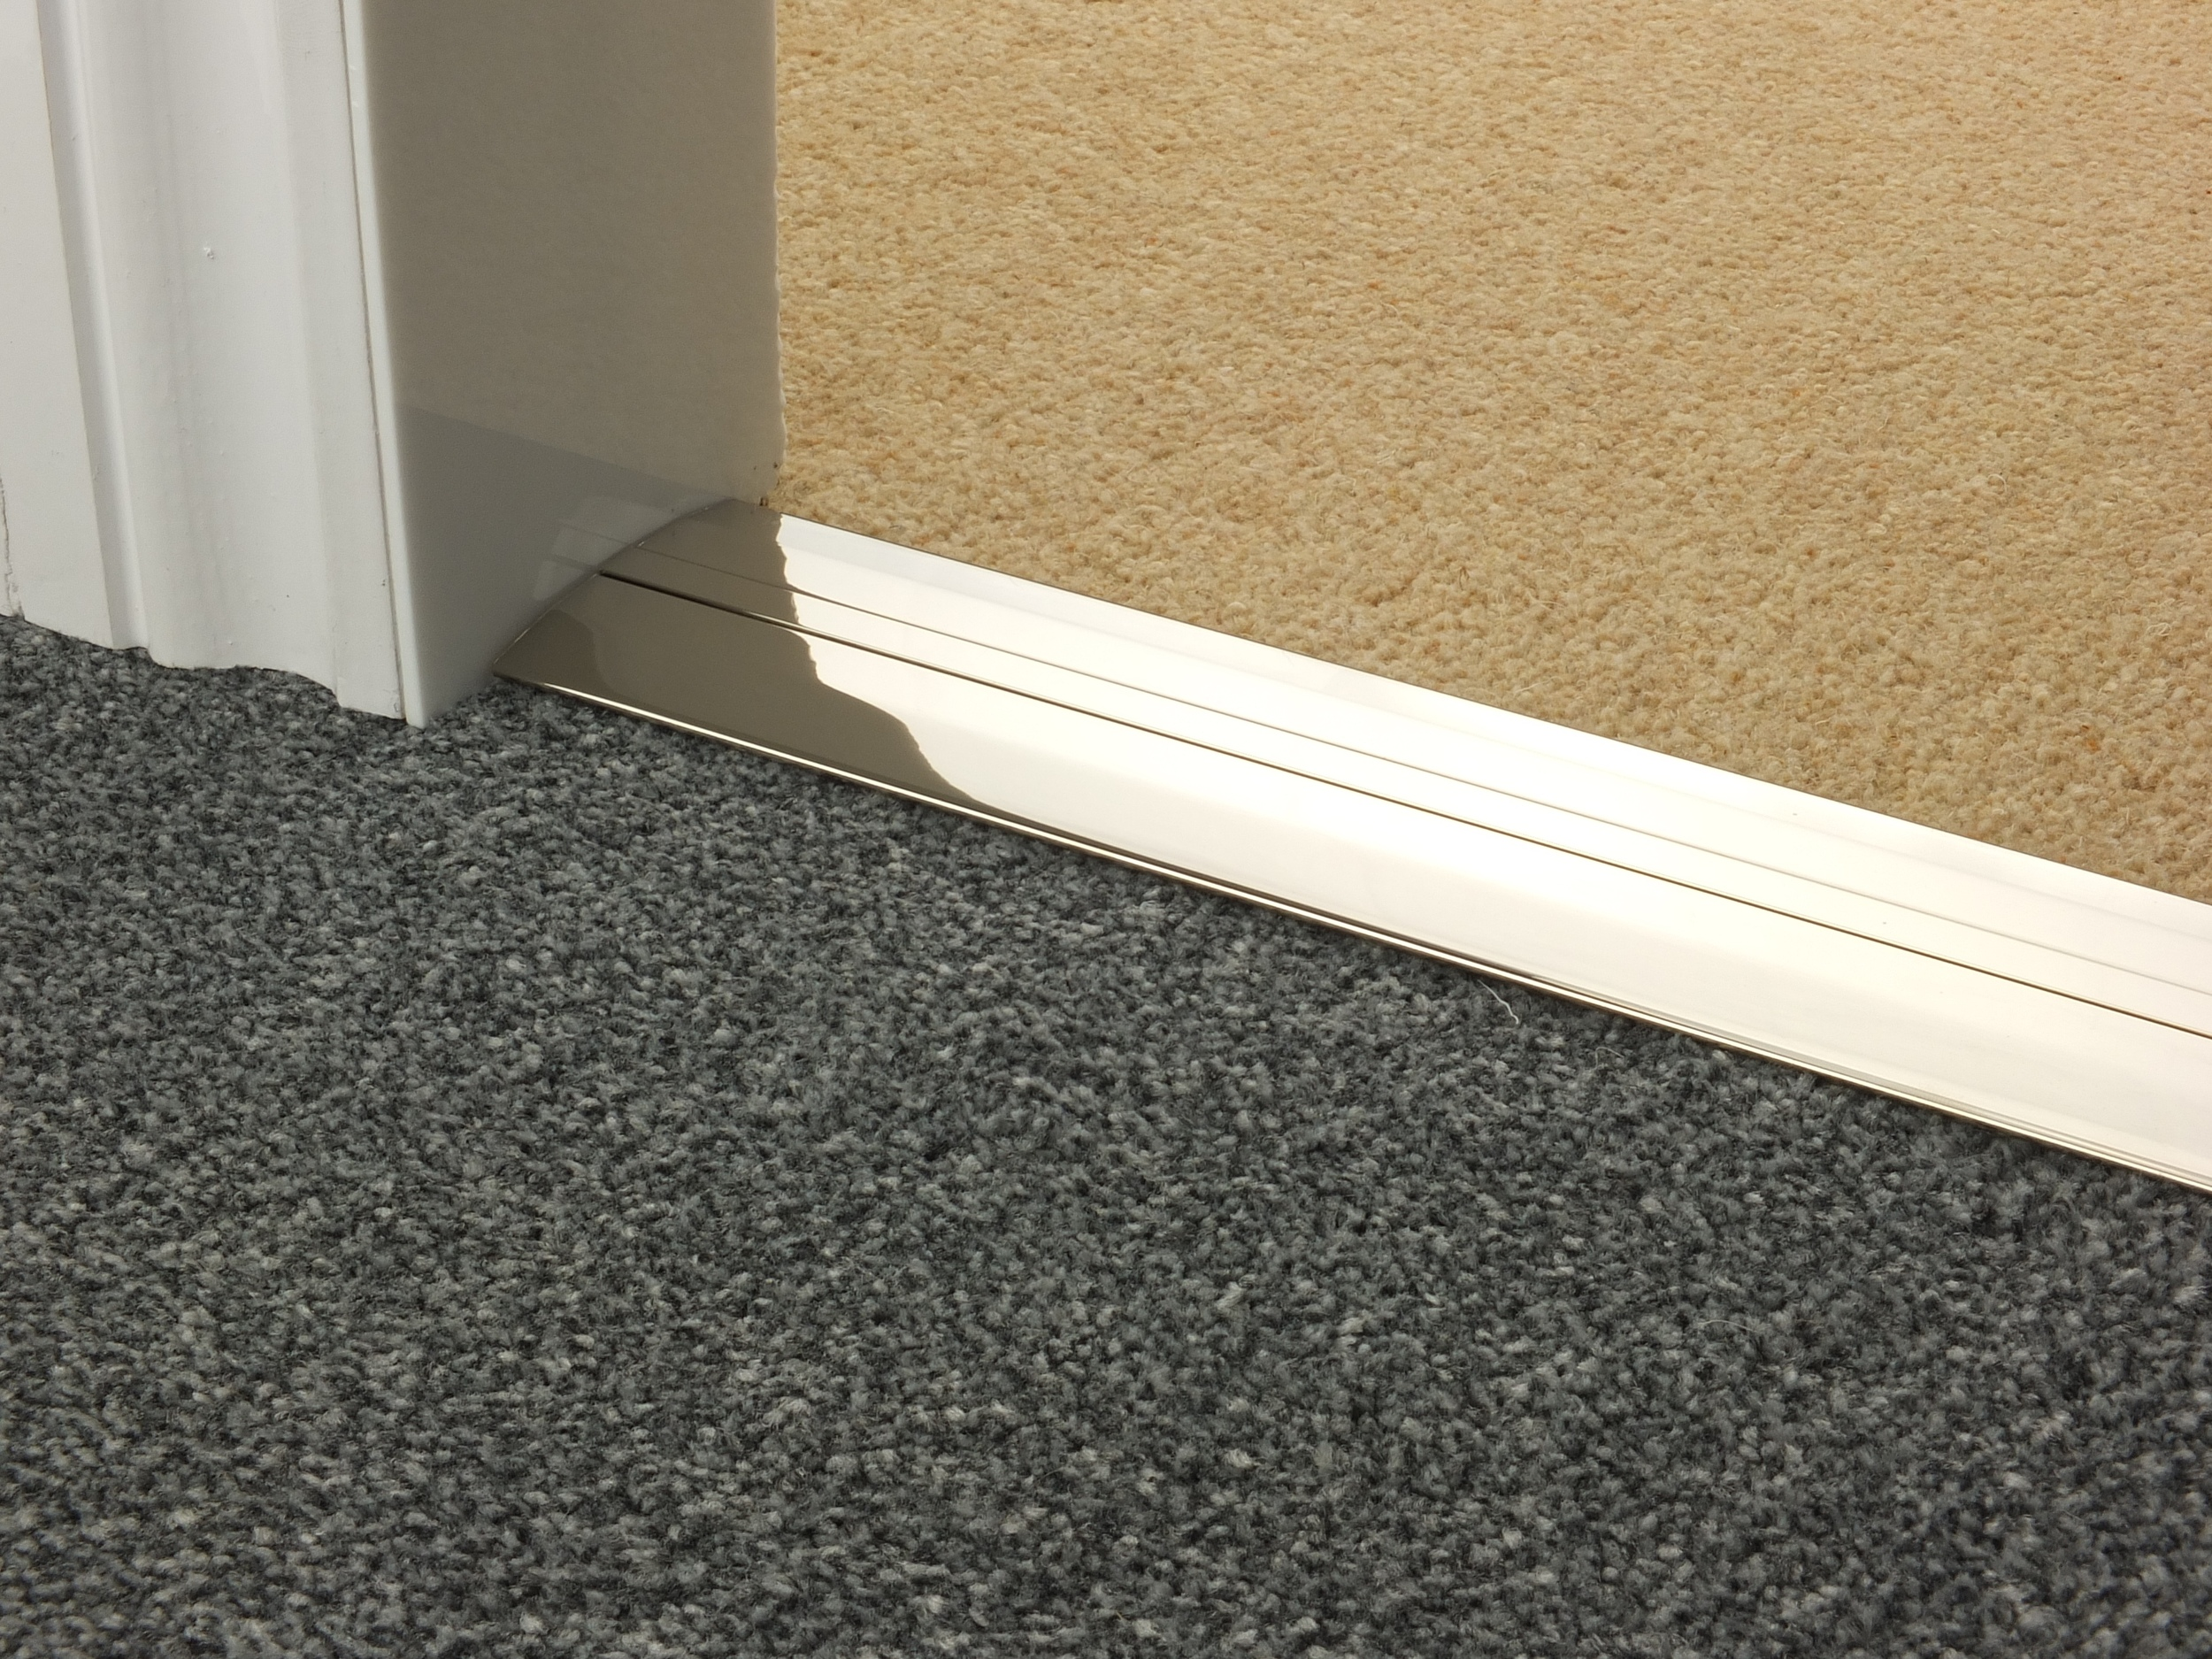 door_bar_polished_nickel_posh55_carpet_carpet.jpg